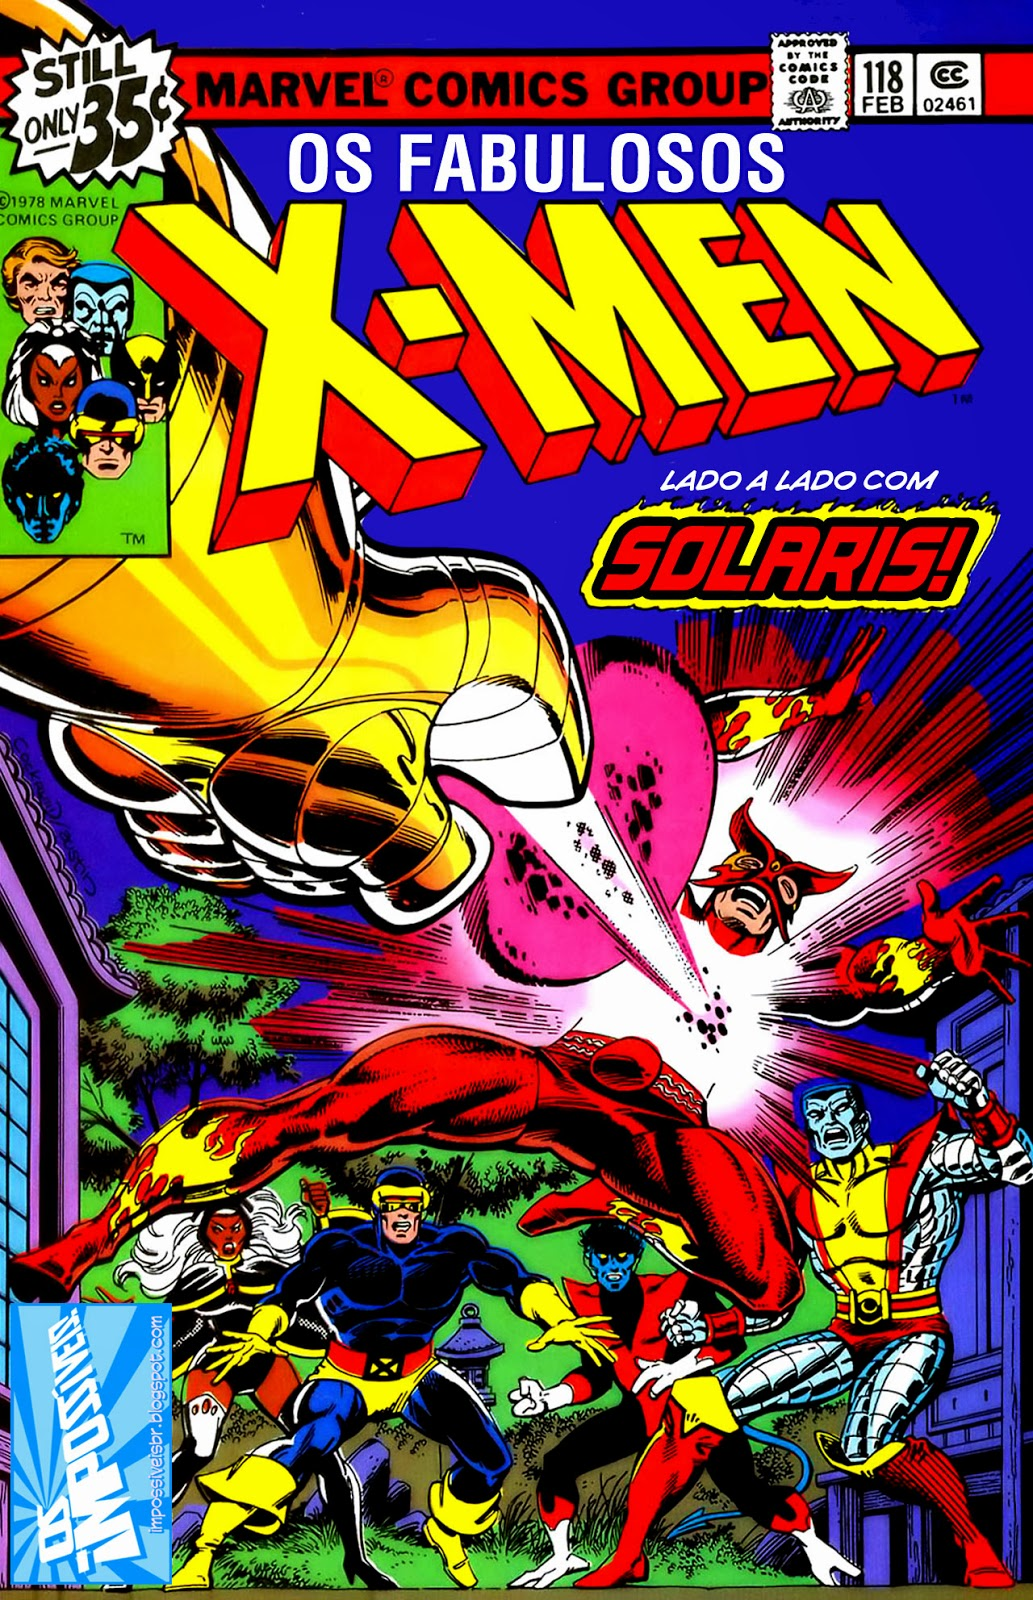 http://www.mediafire.com/download/hm08ojqo558yw28/Os.Fabulosos.X-Men.(X-Men.V1).118.HQBR.28OUT13.Os.Impossiveis.cbr